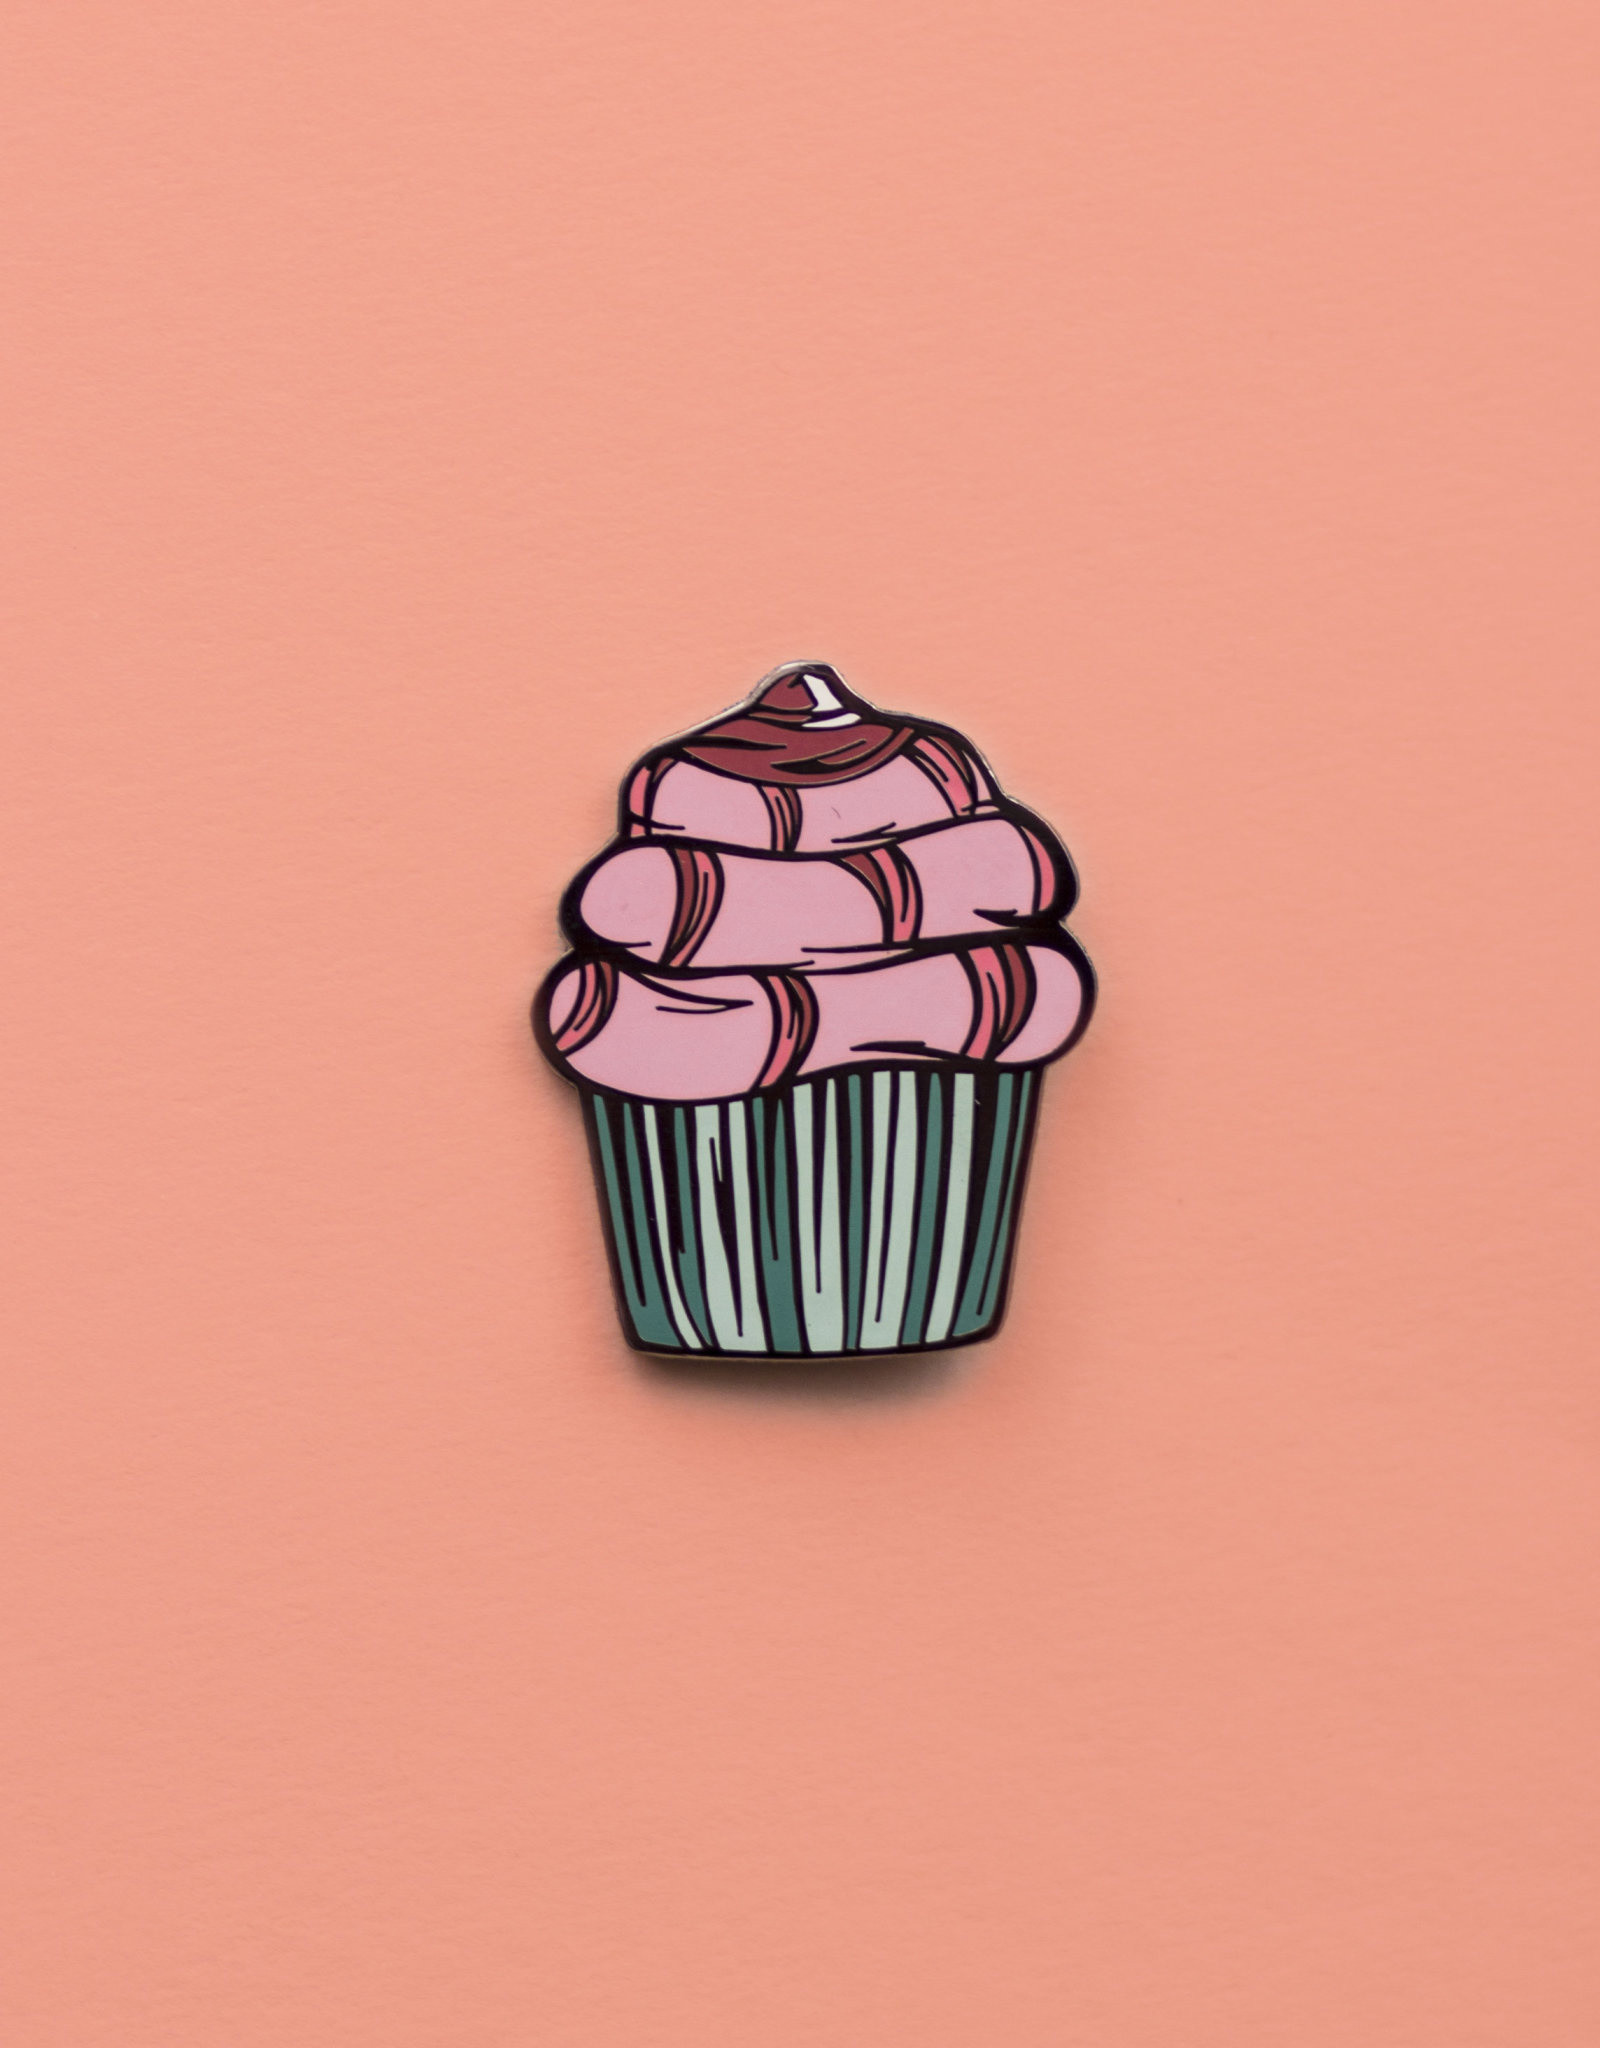 Kaitlin Ziesmer Dirty Desserts Enamel Pins by Kaitlin Ziesmer